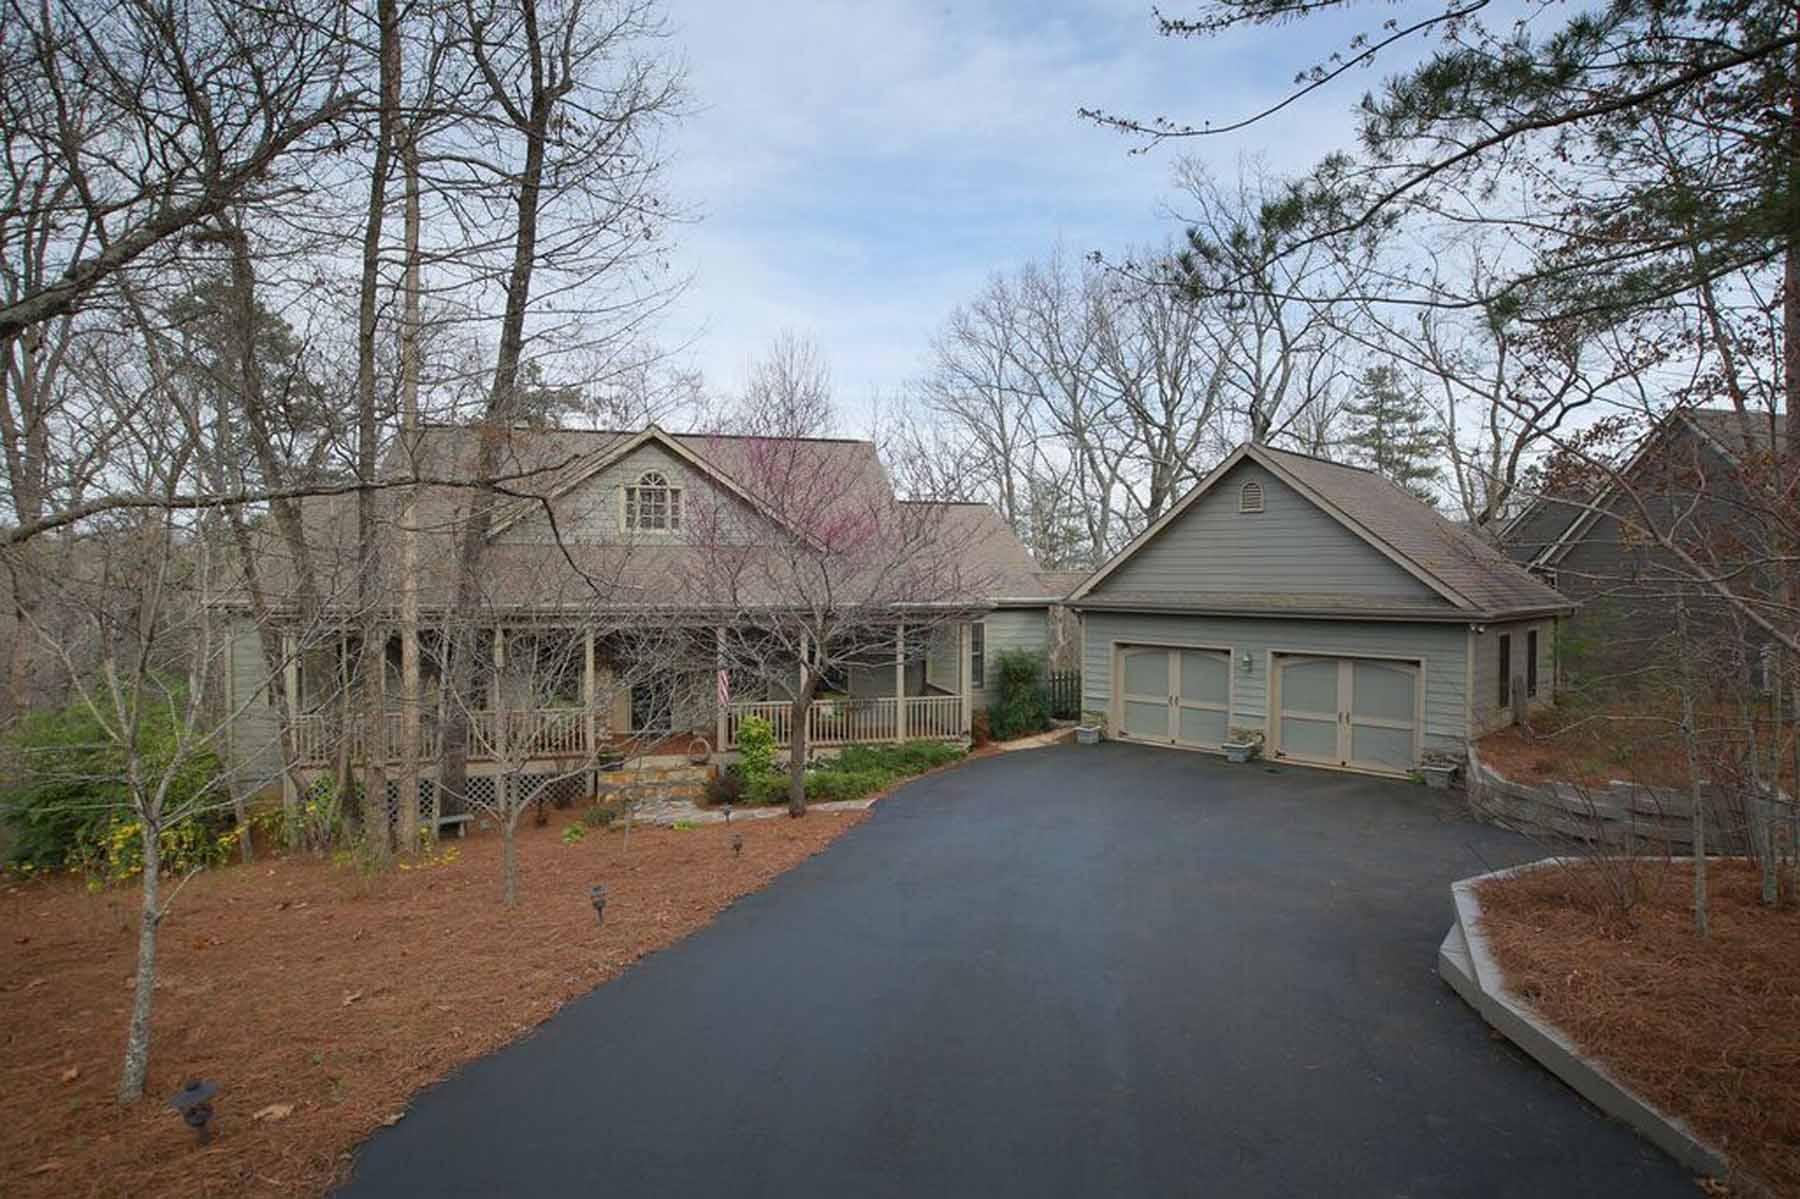 Single Family Home for Sale at Charming Mountain Home 62 Cherokee Knoll Big Canoe, Georgia, 30143 United States